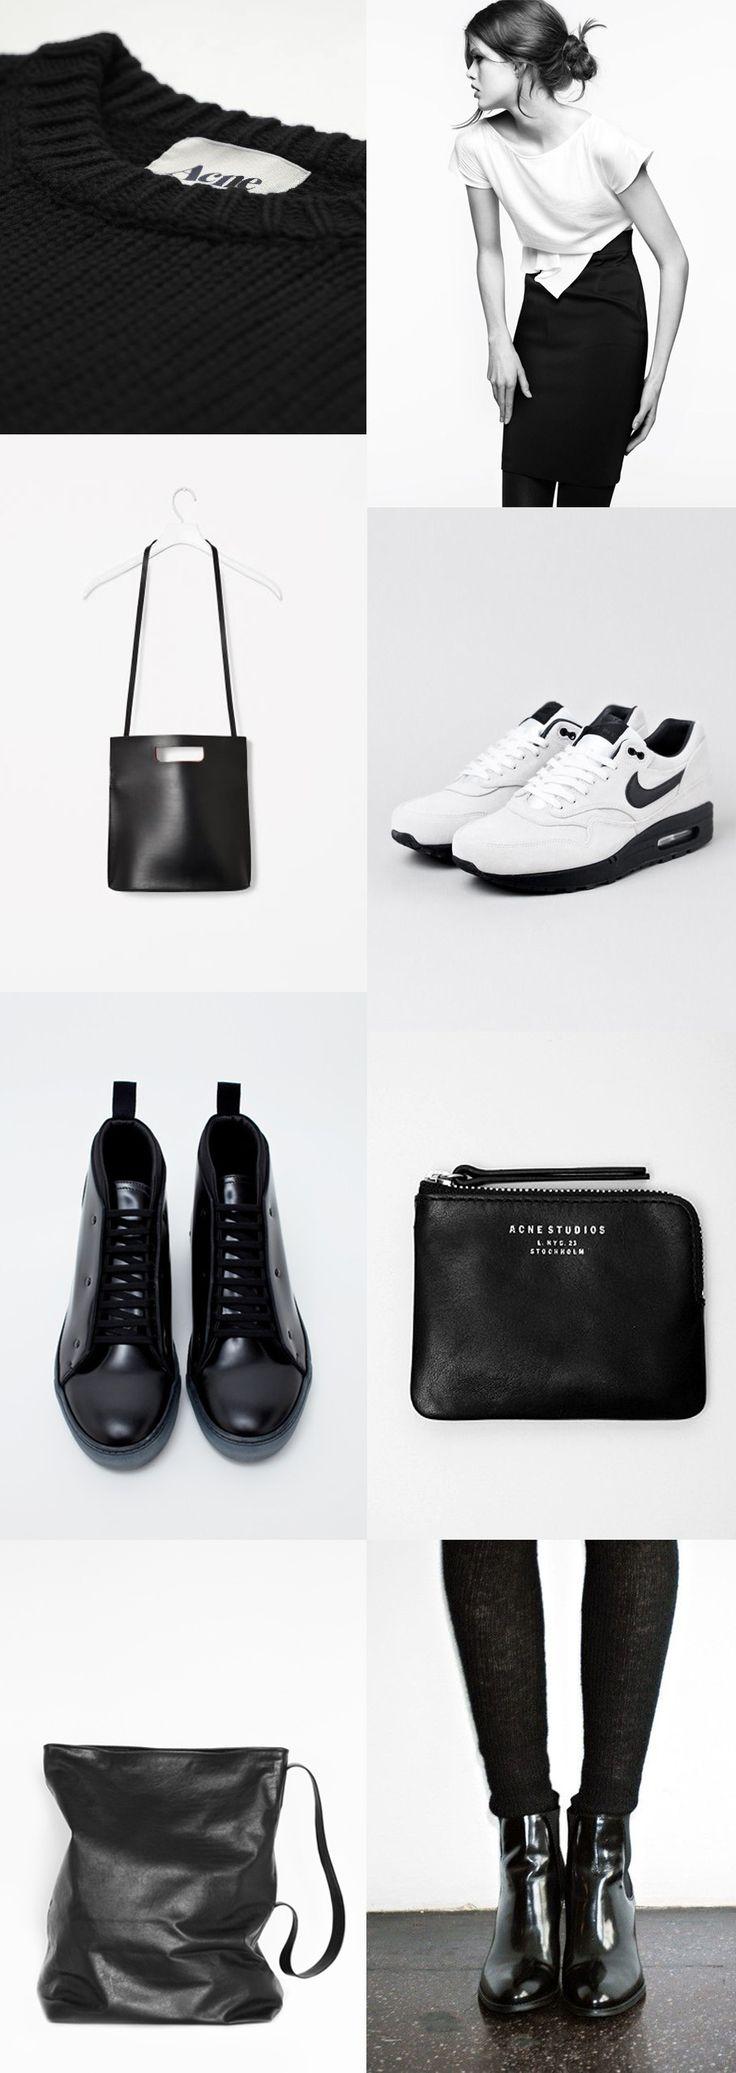 Black & white style // alostplace.com : Minimal + Classic | Nordhaven Studio